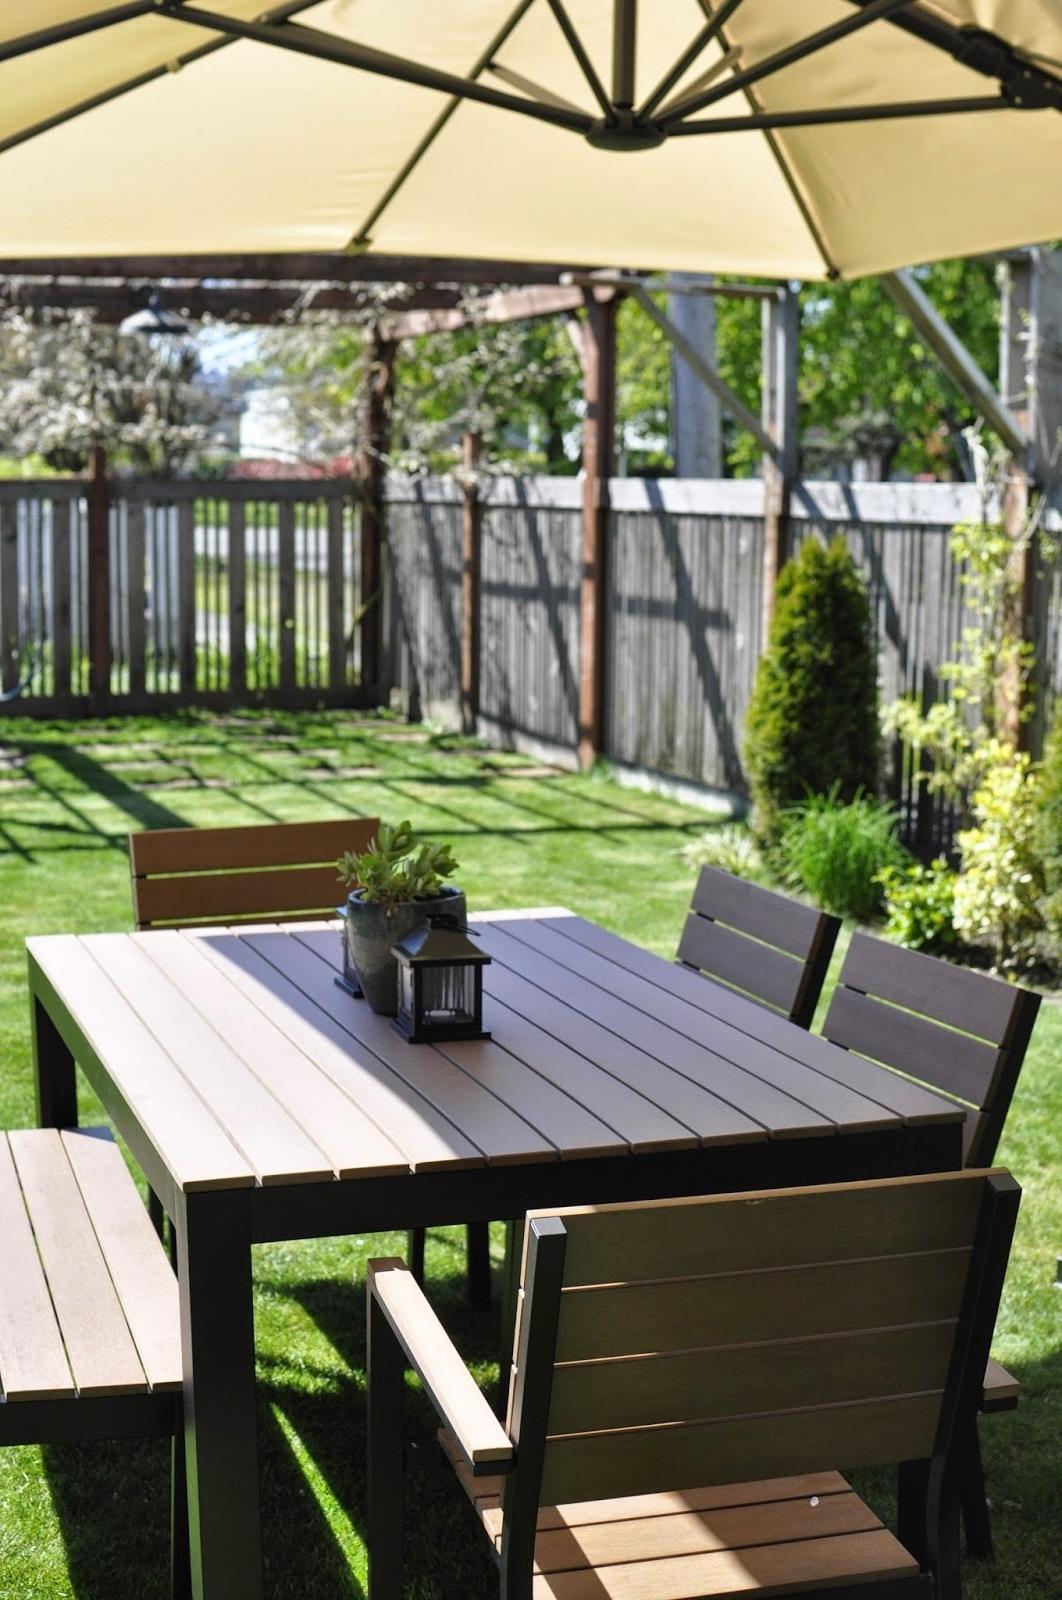 Ikea Outdoor Patio Furniture Canada – Outdoor Designs With Regard To Popular Ikea Patio Conversation Sets (View 2 of 20)